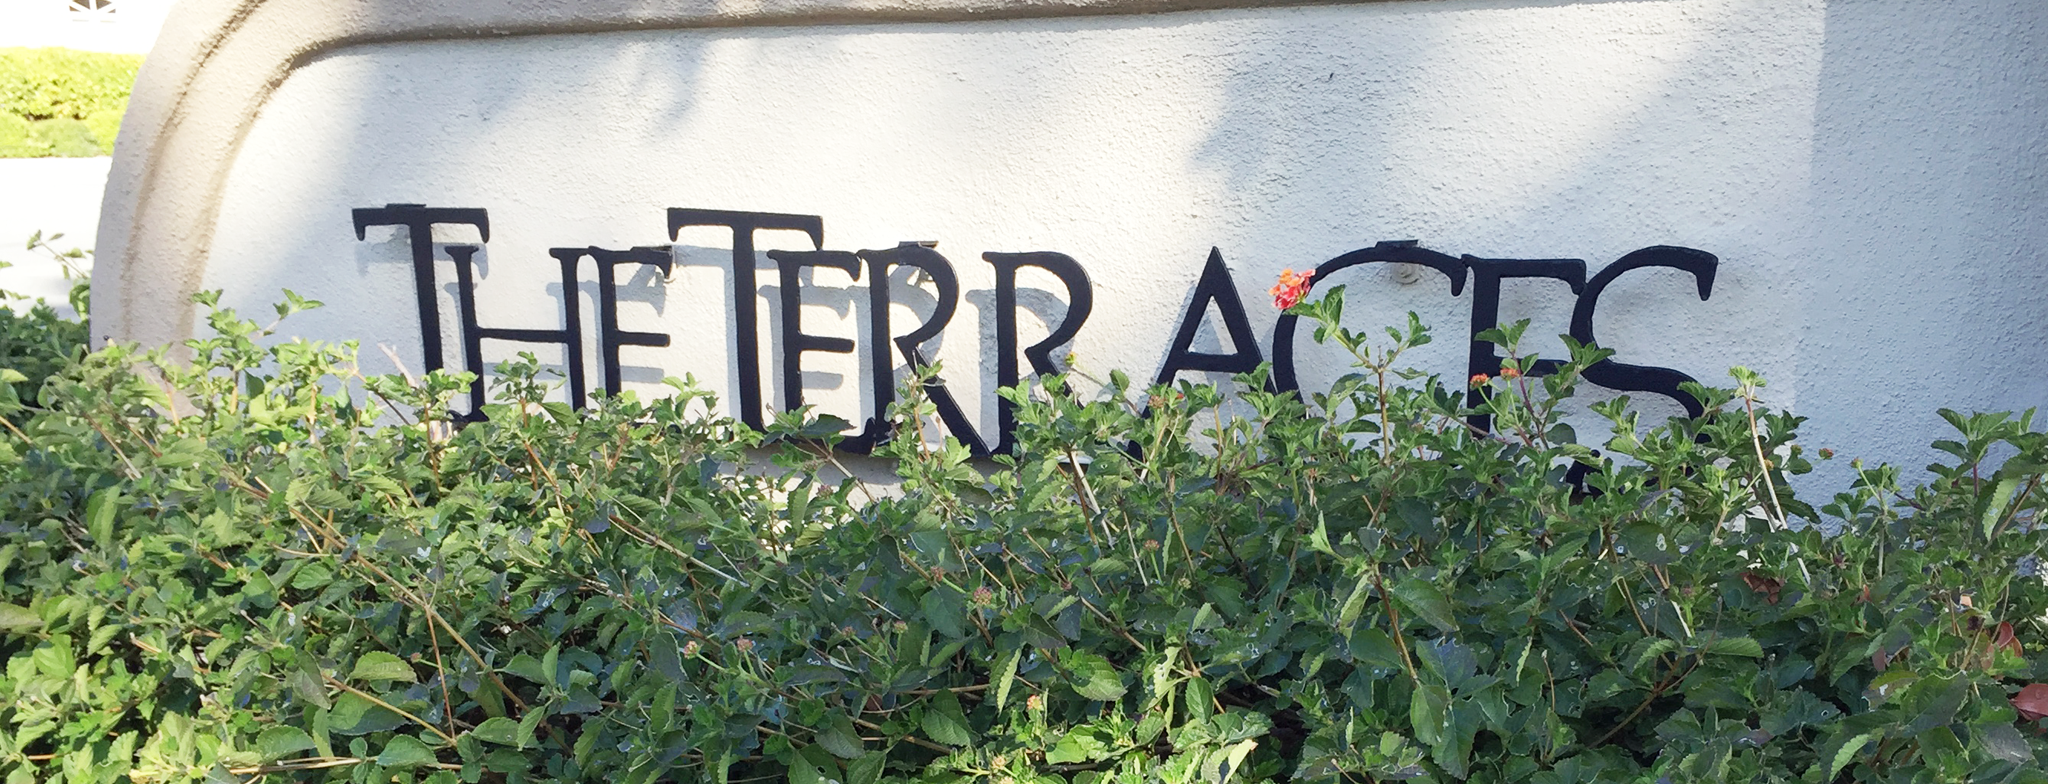 Welcome to Coto de Caza Terraces' Community Website!